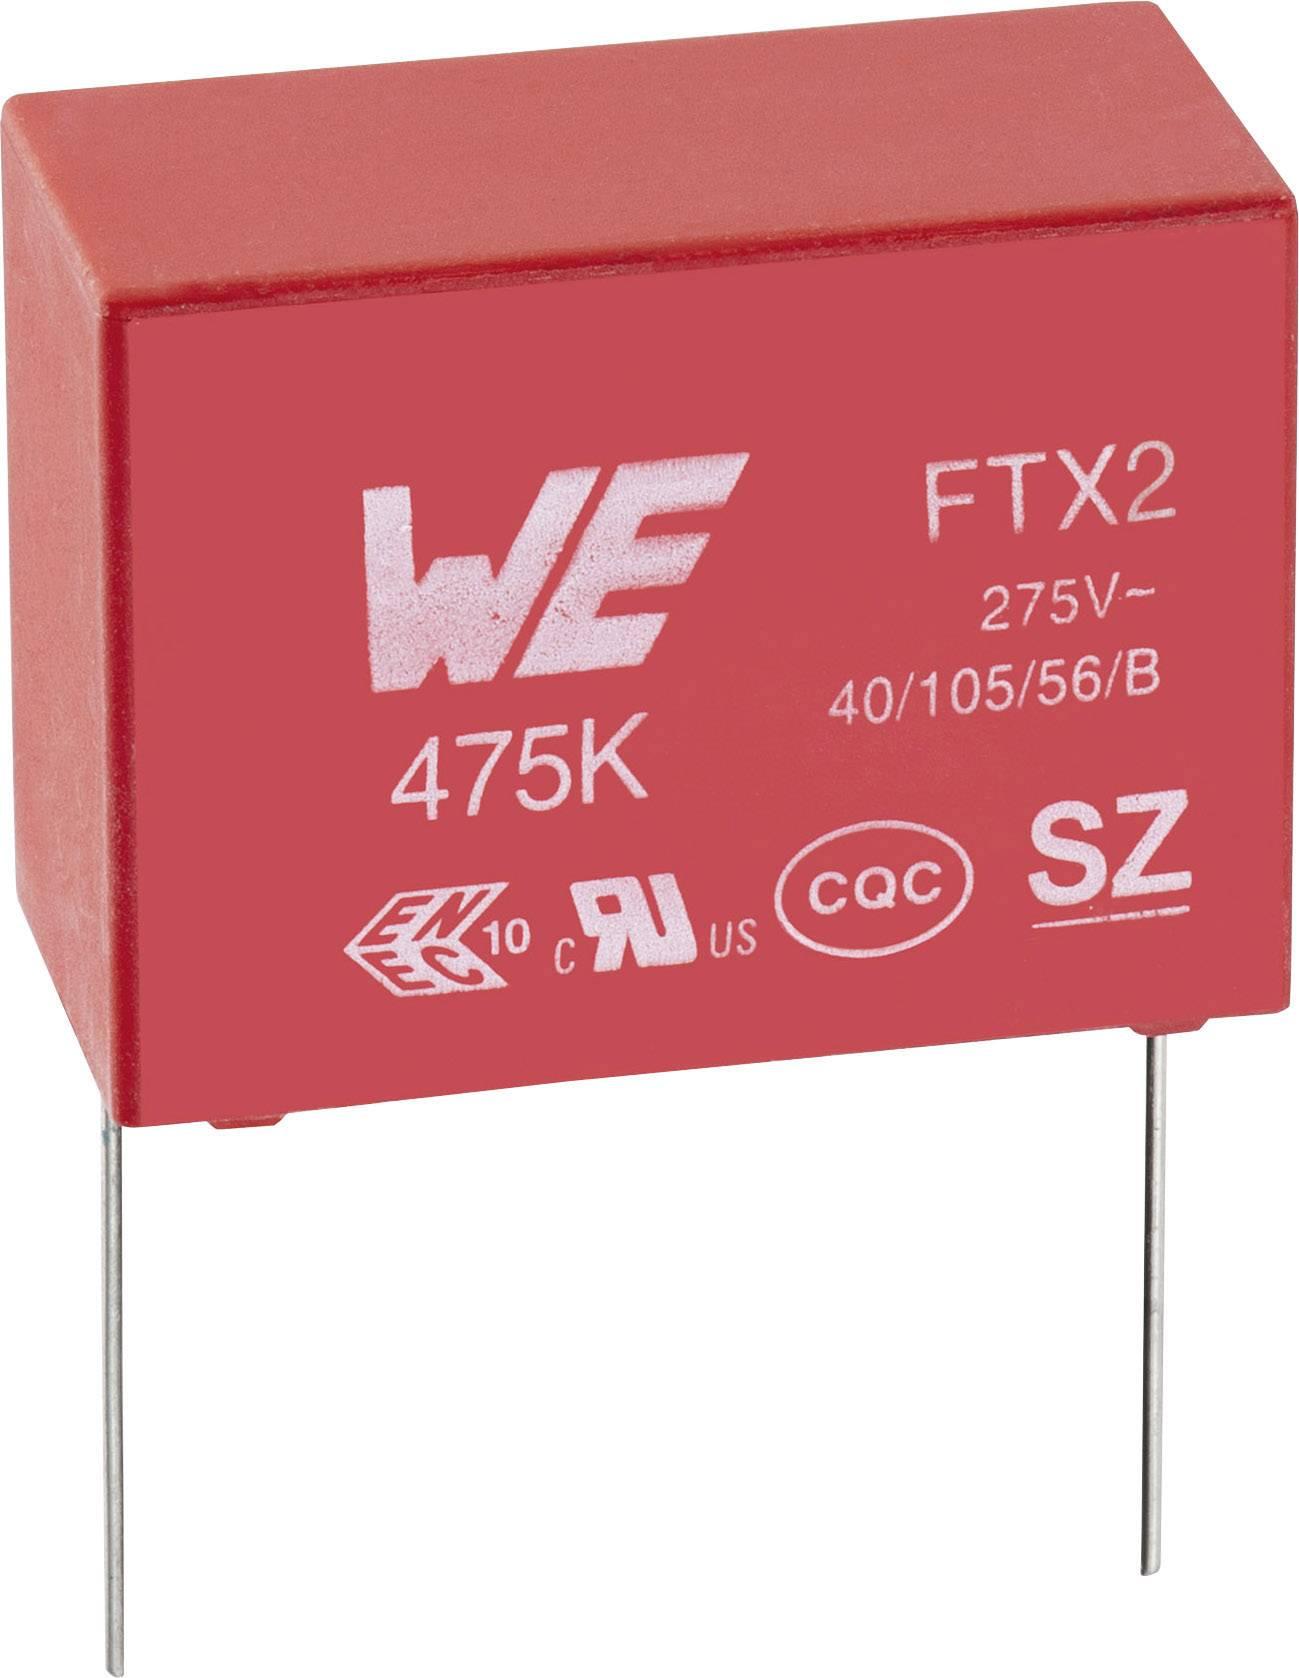 Foliový kondenzátor Würth WCAP-FTX2, 890324024005CS, 470000 pF, 275 V/AC, 10%, RM 12.5 mm